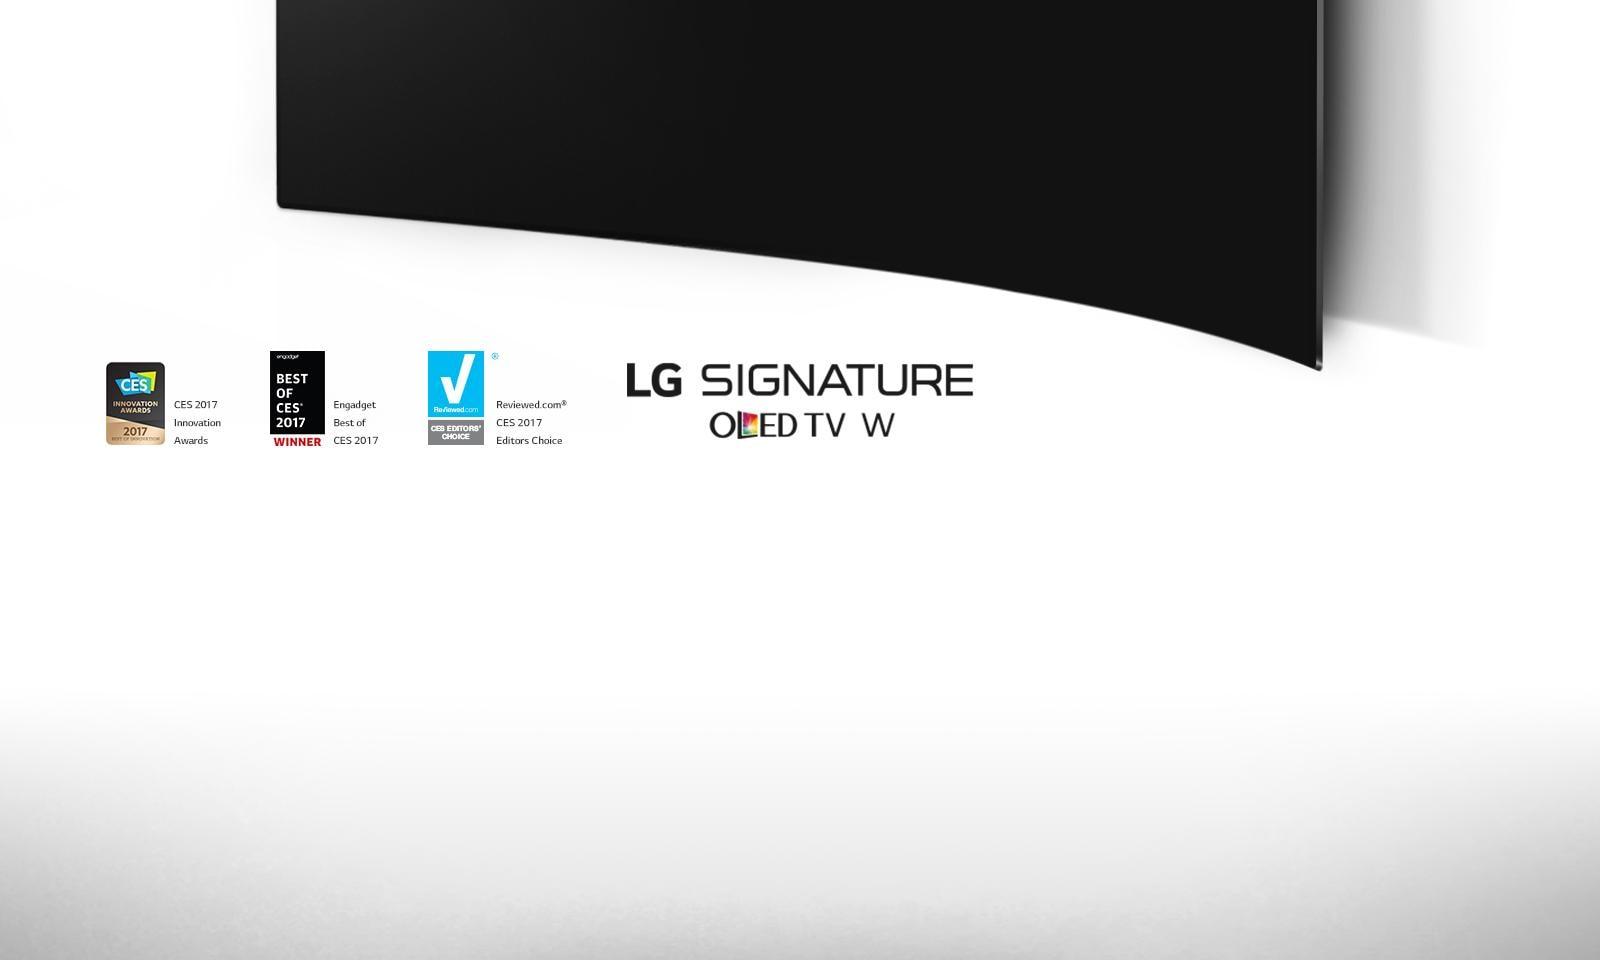 lg oled77g7p 77 inch lg signature oled 4k hdr smart tv lg usa